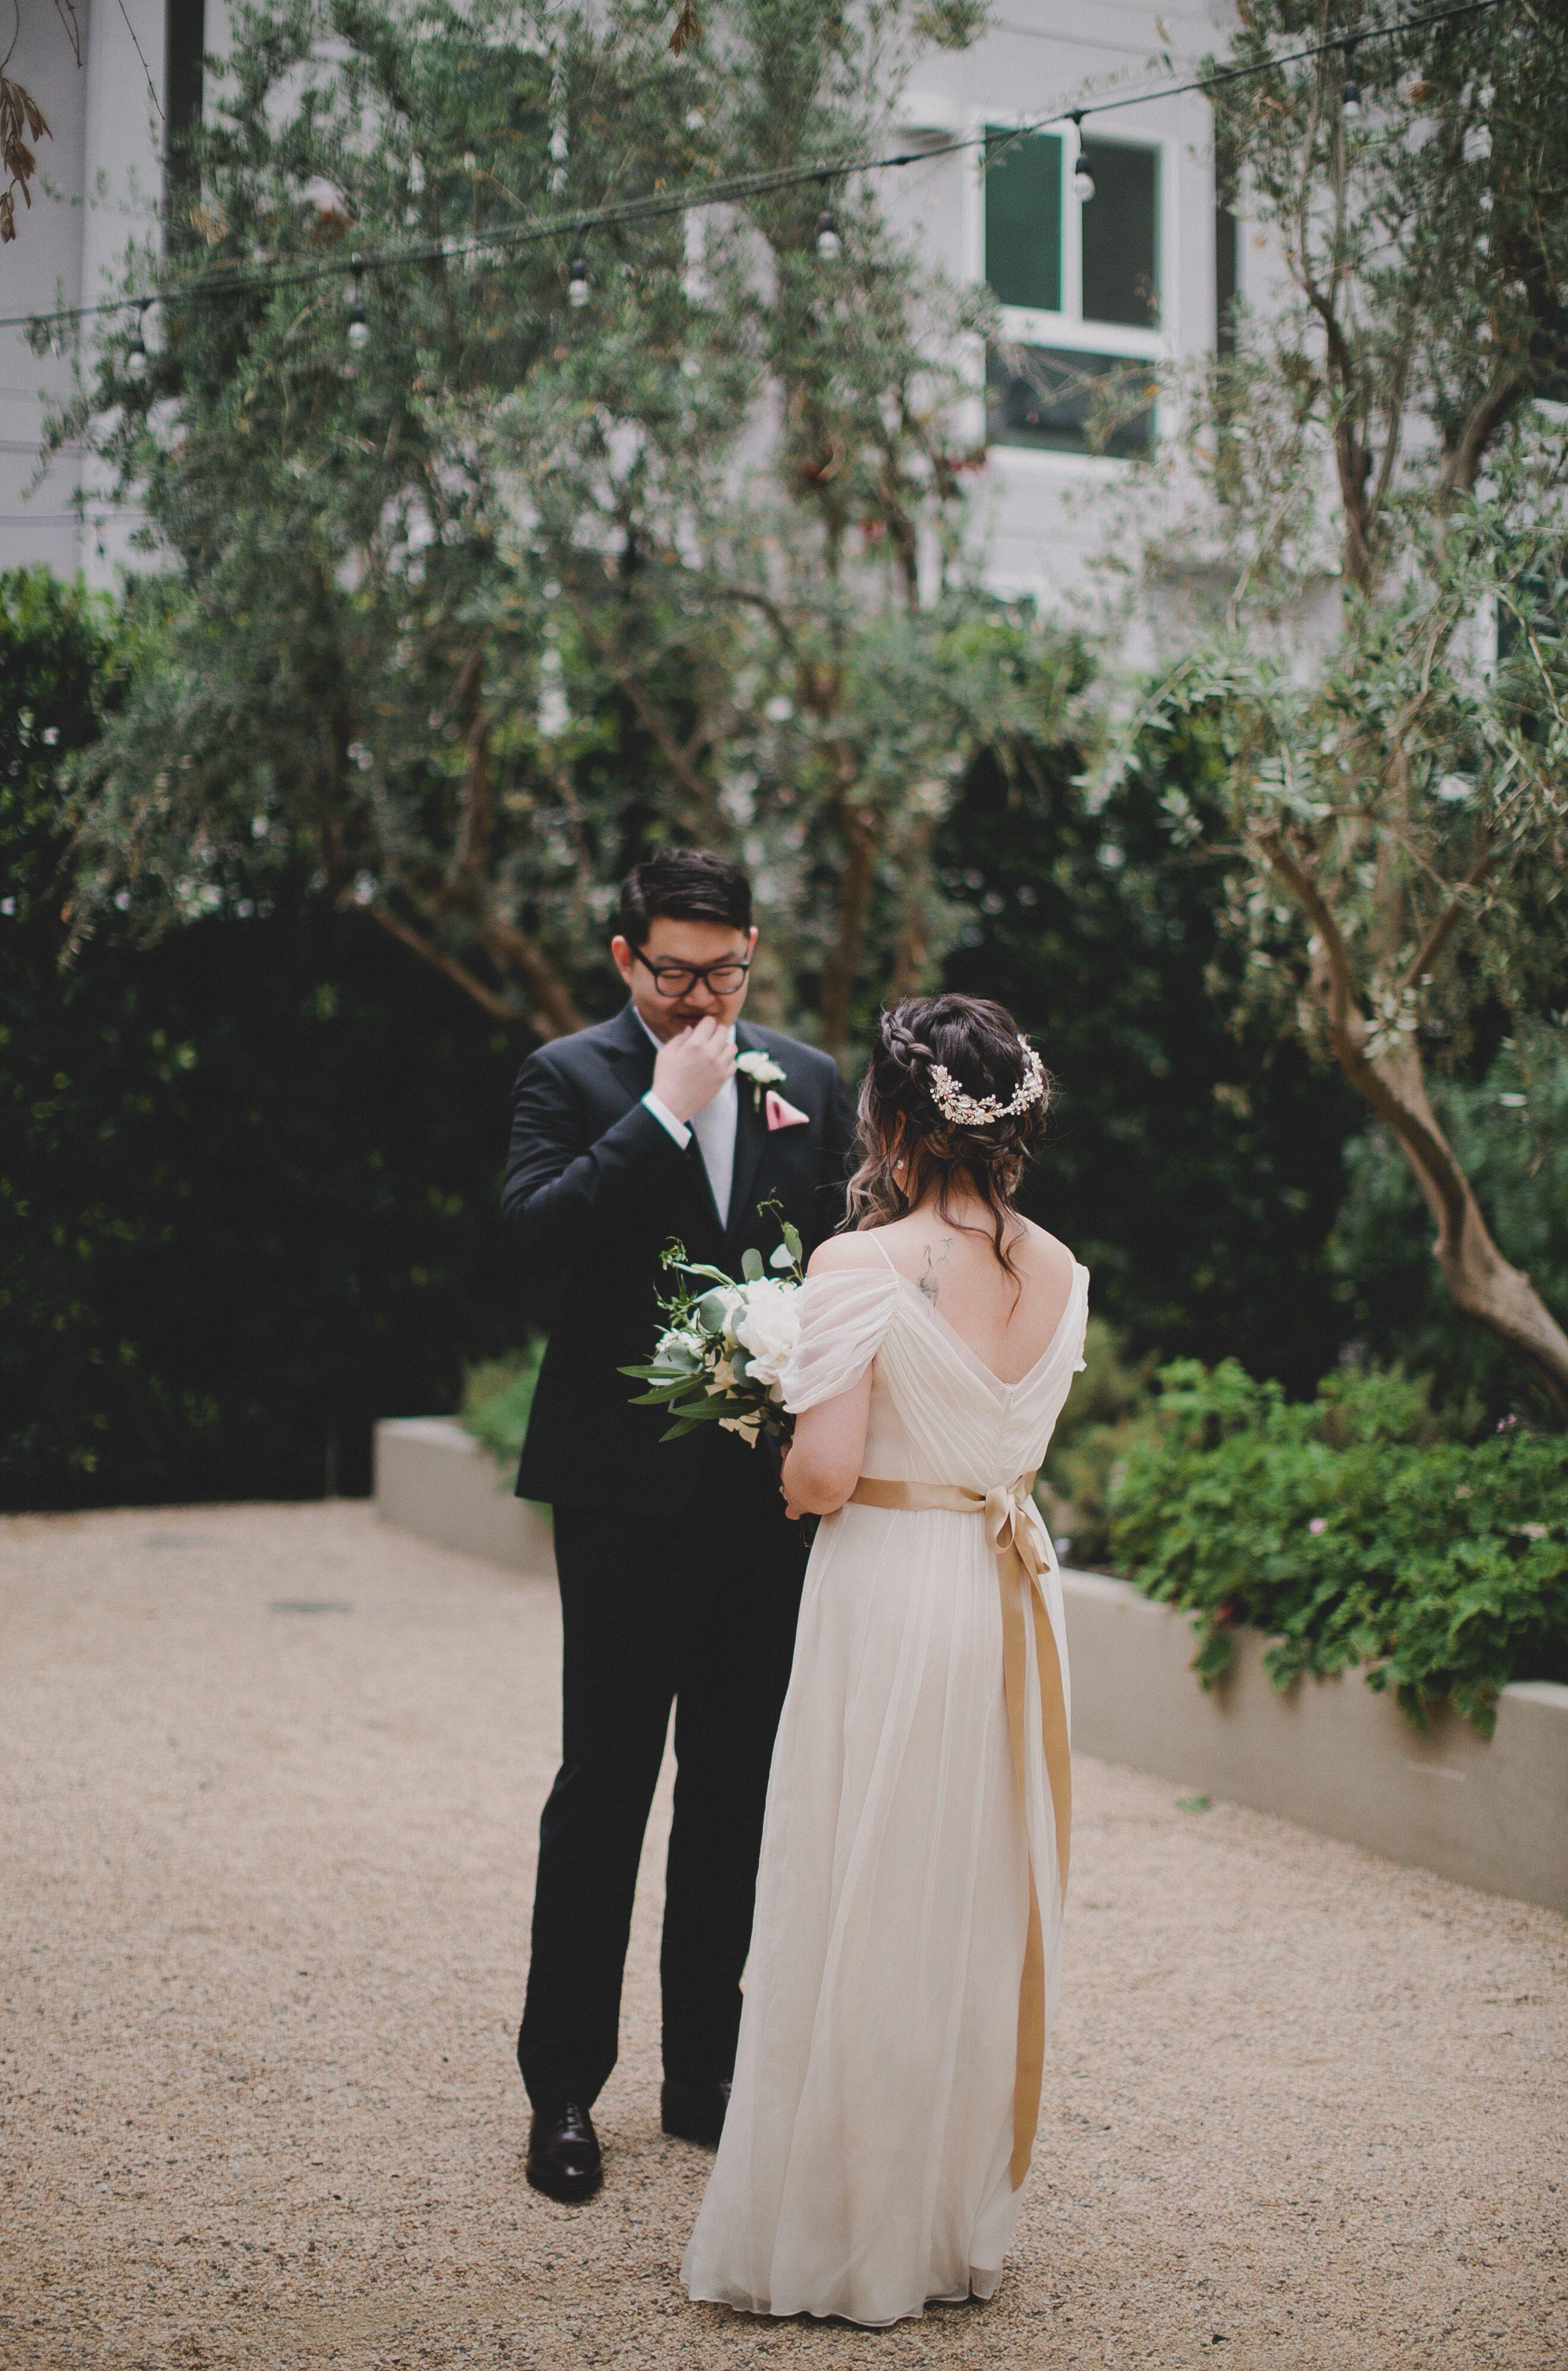 Saja Wedding | Romantic Wedding Dress | Grecian Wedding Dress #grecianweddingdresses